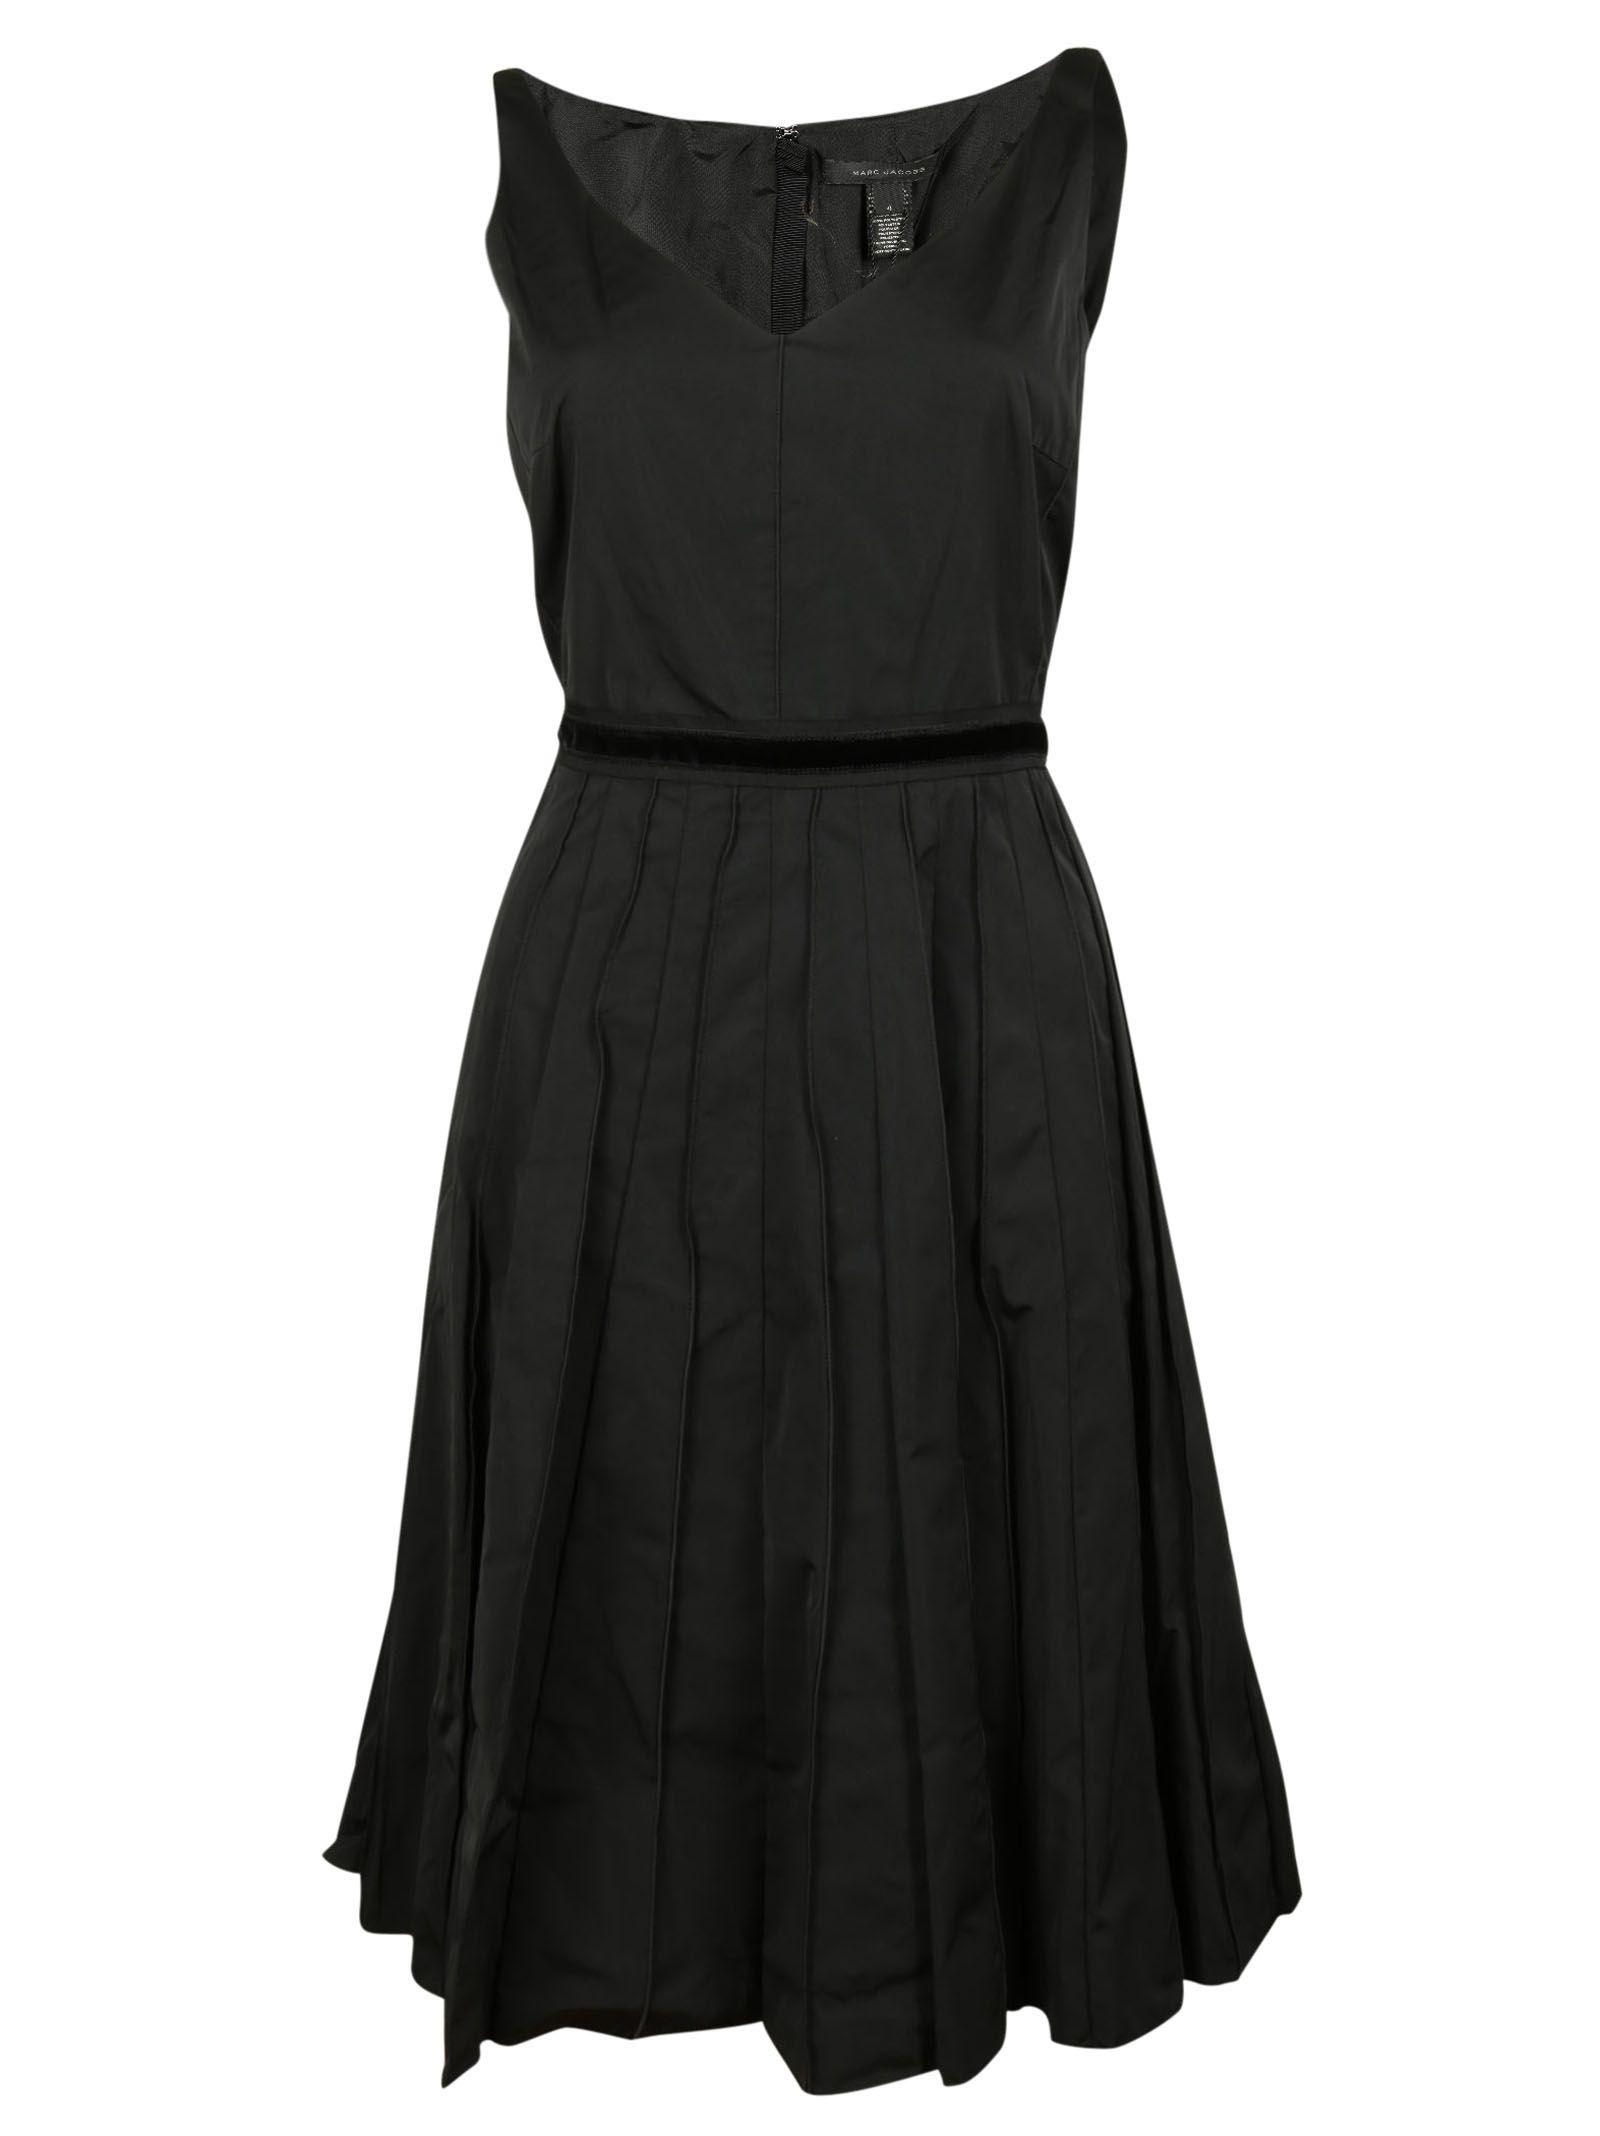 marc jacobs female 188971 black sleeveless dress